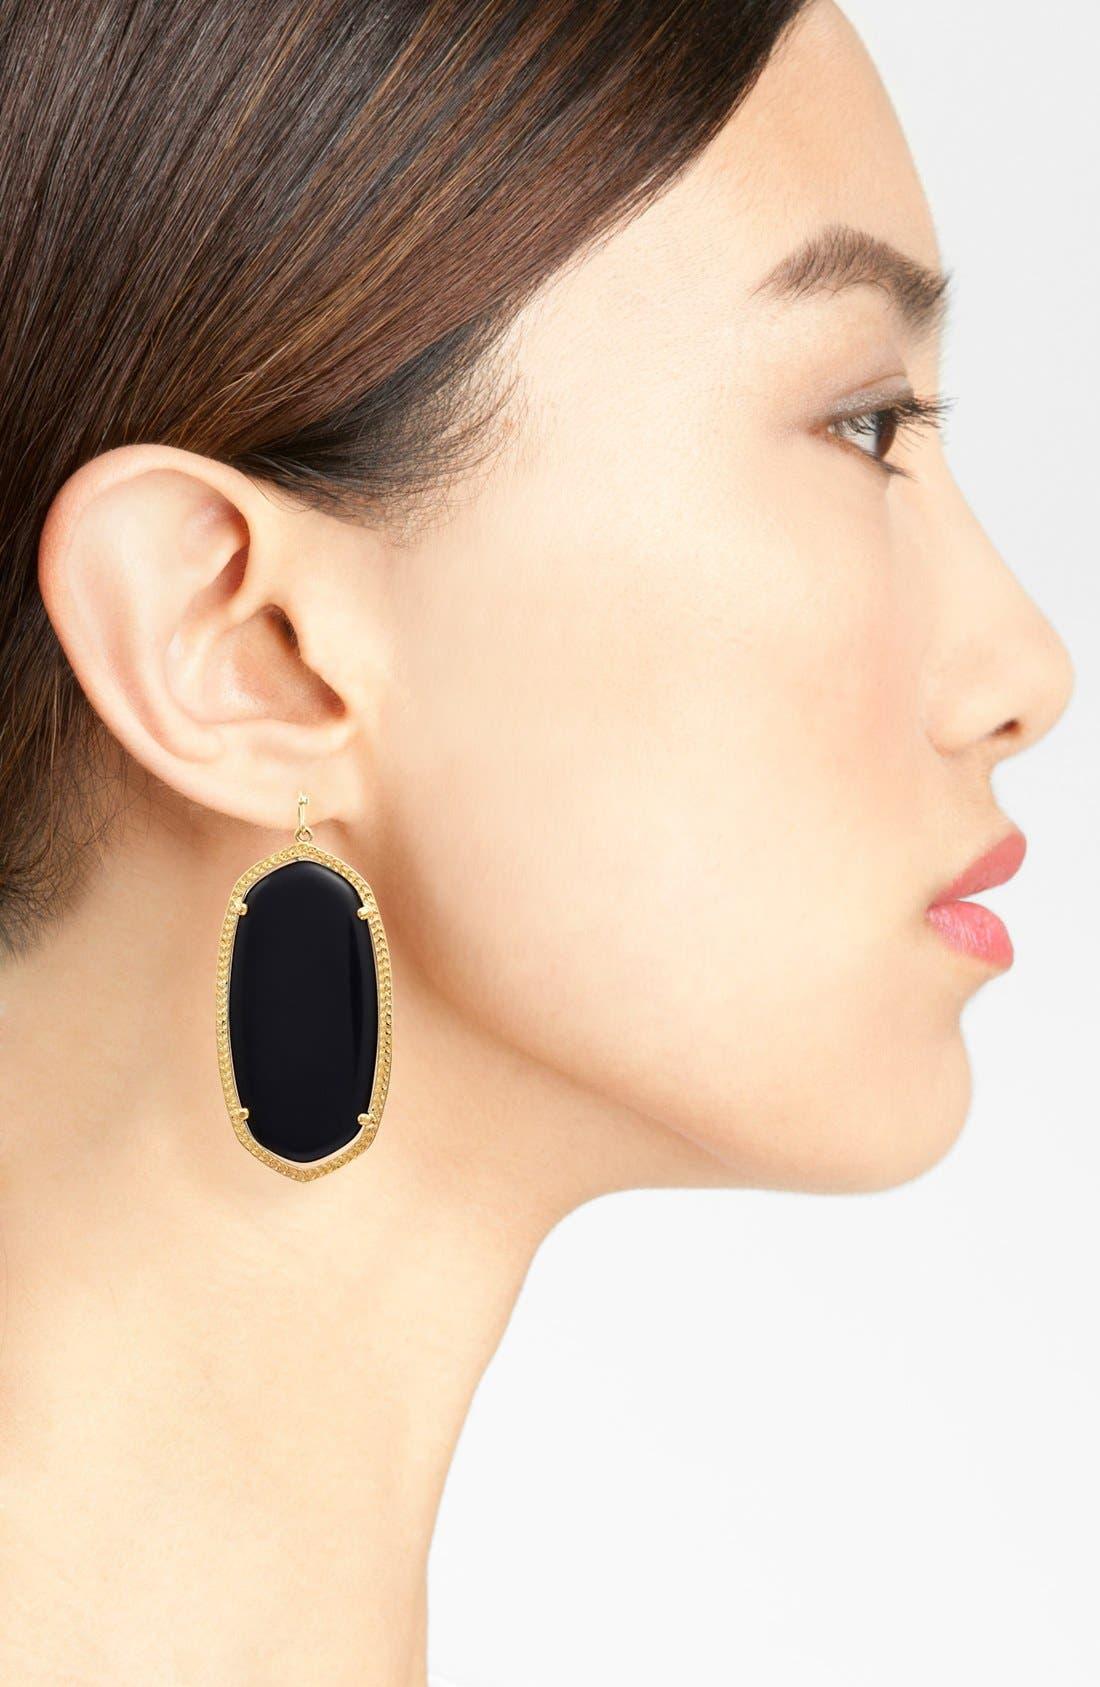 'Danielle' Oval Statement Earrings,                             Alternate thumbnail 3, color,                             001